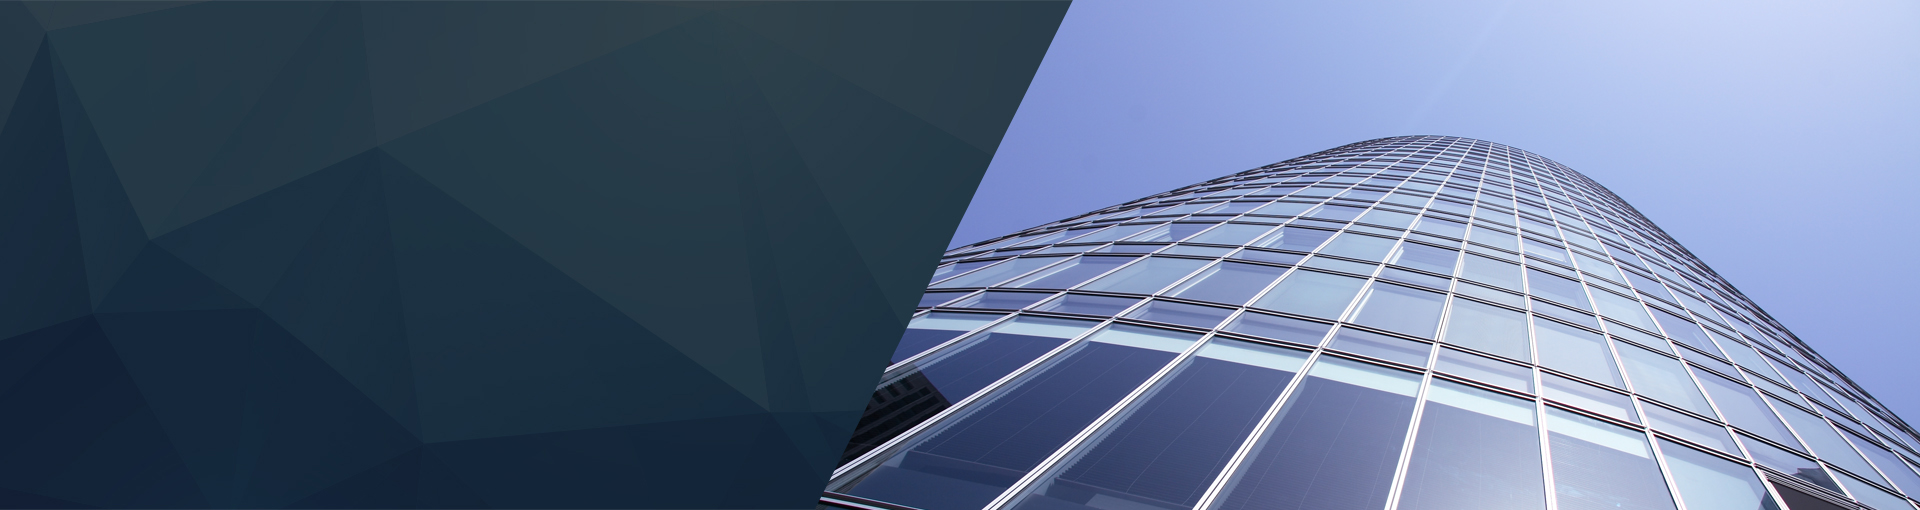 Tall-Building_slide